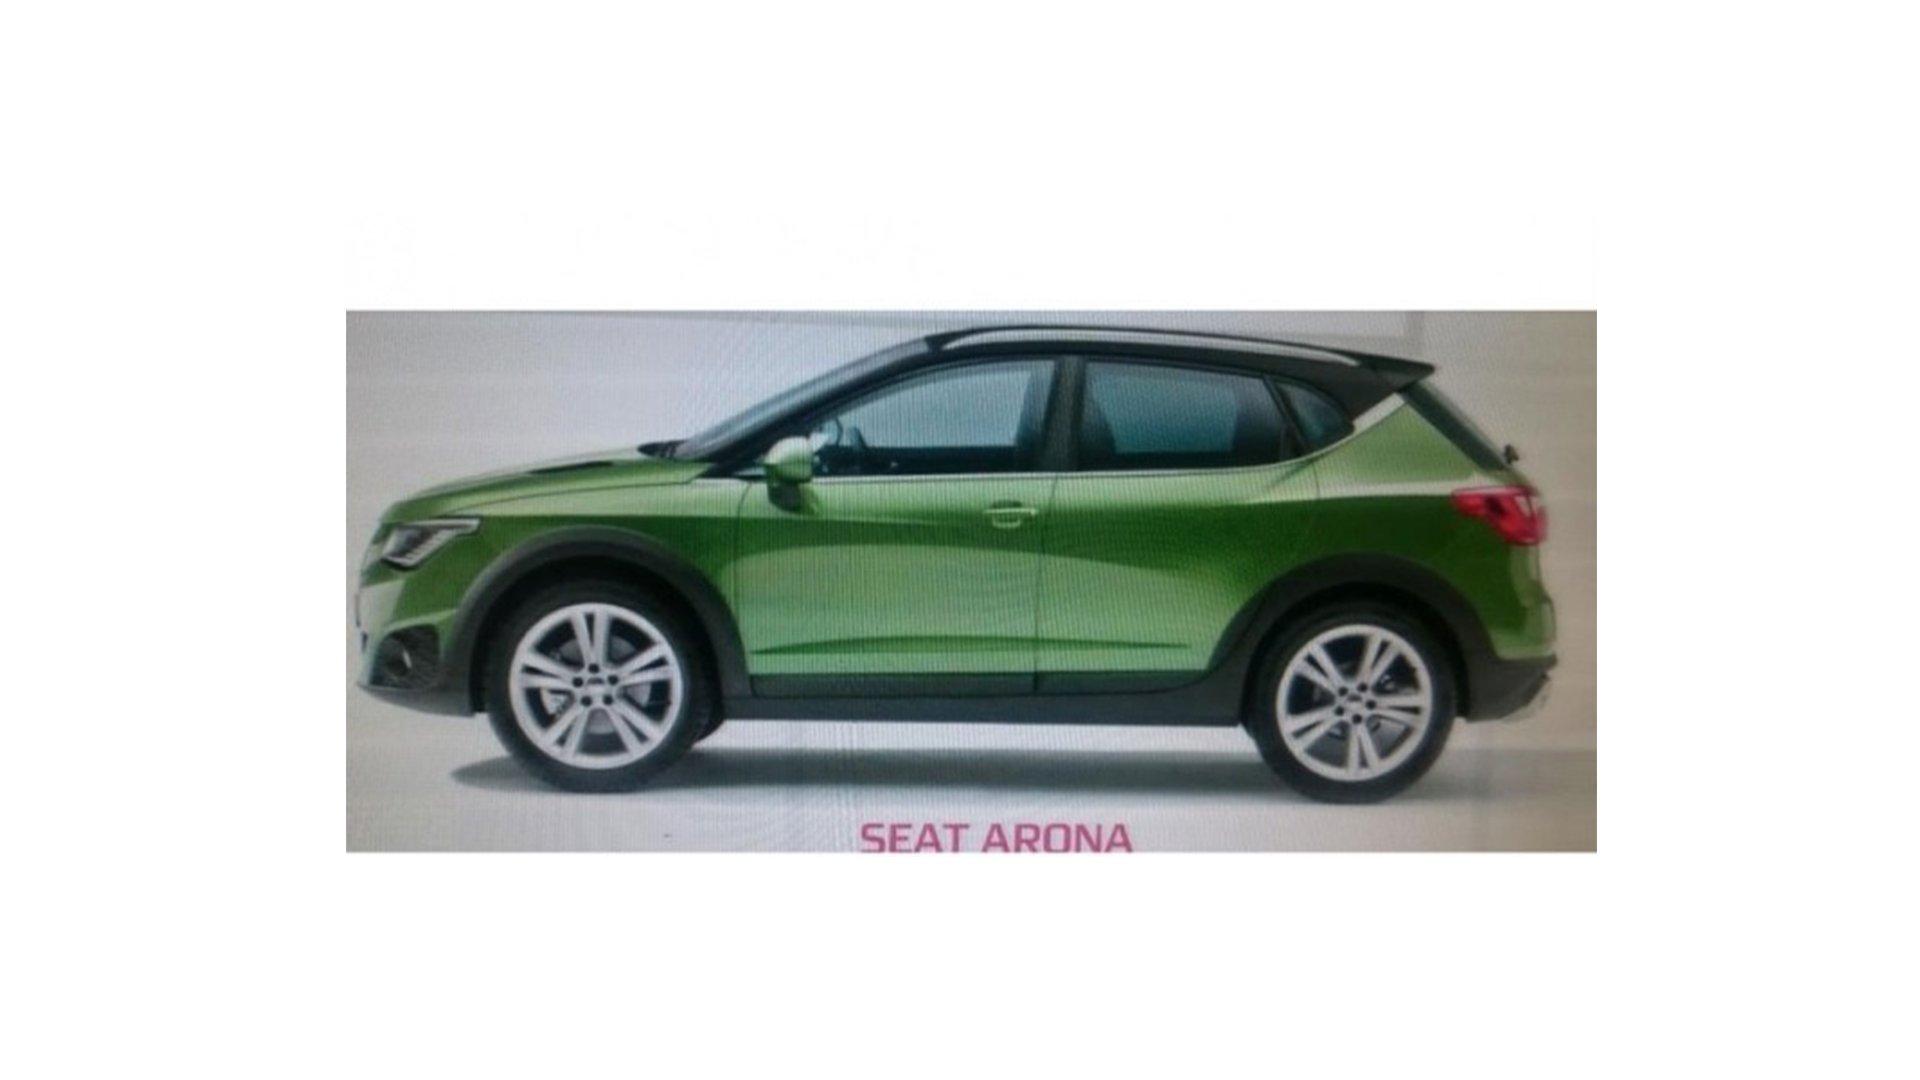 2018 Seat Arona